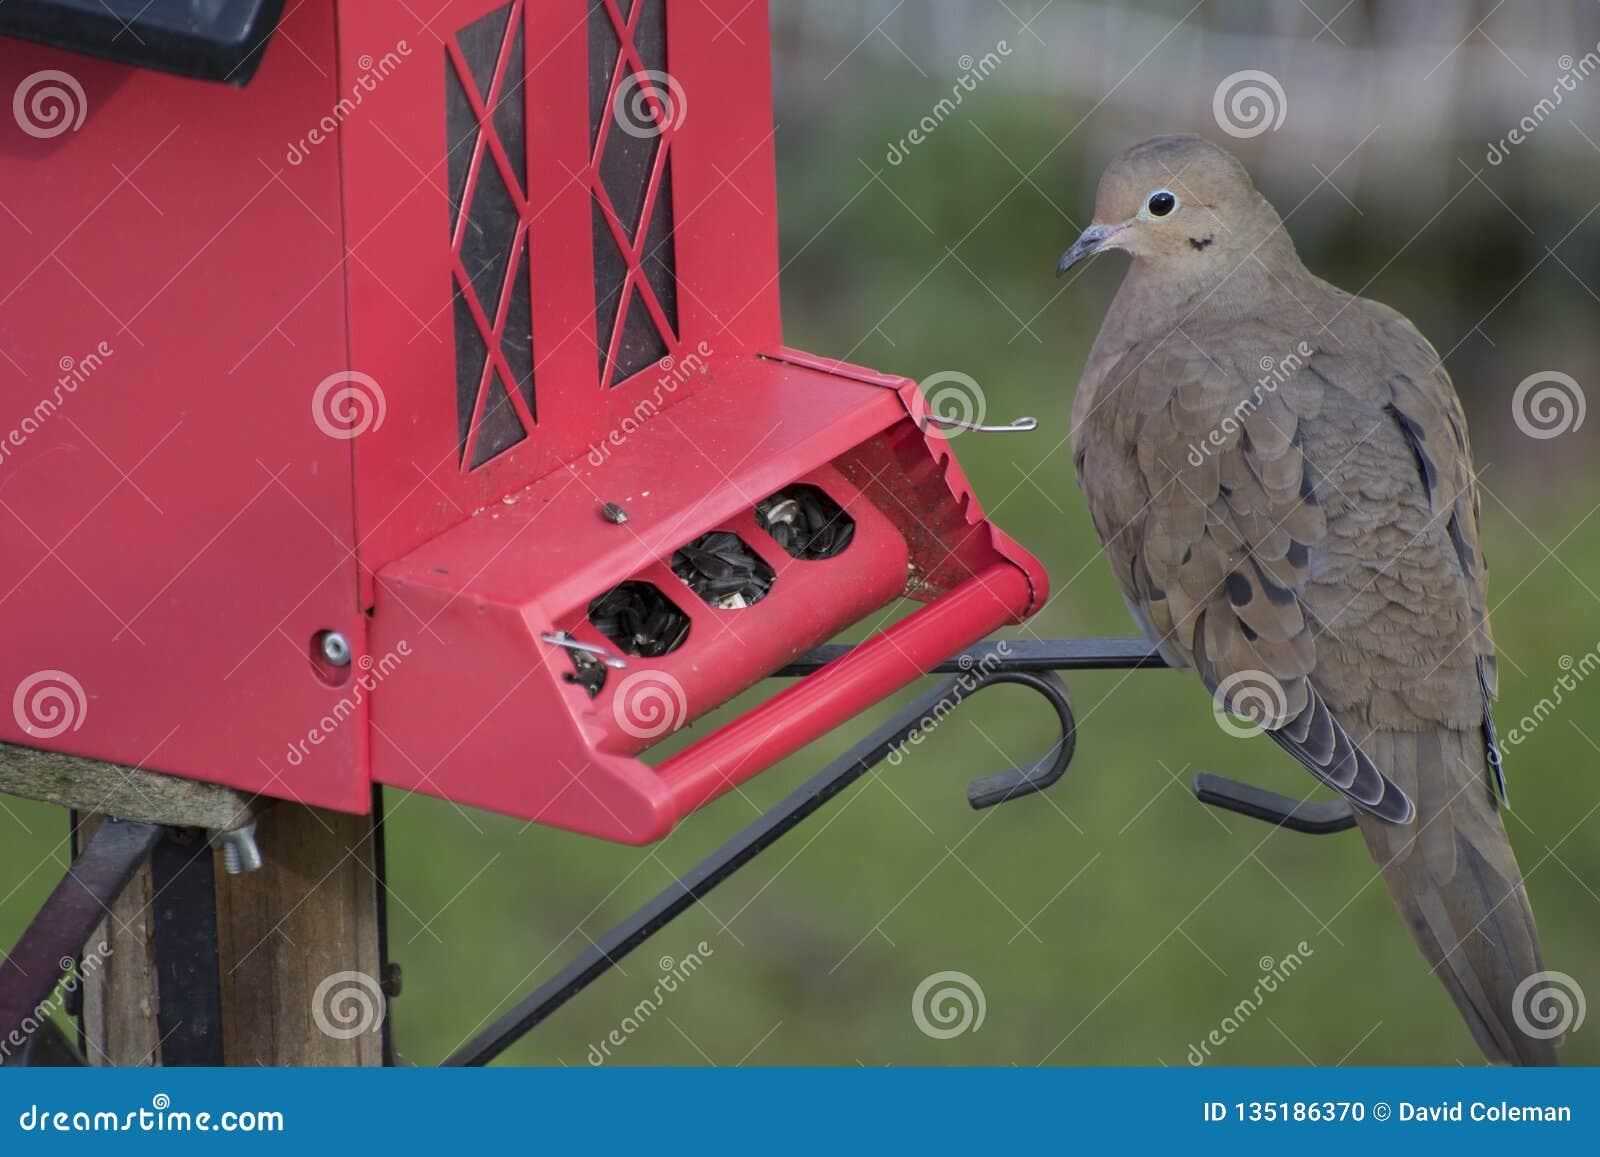 Dove at red bird feeder